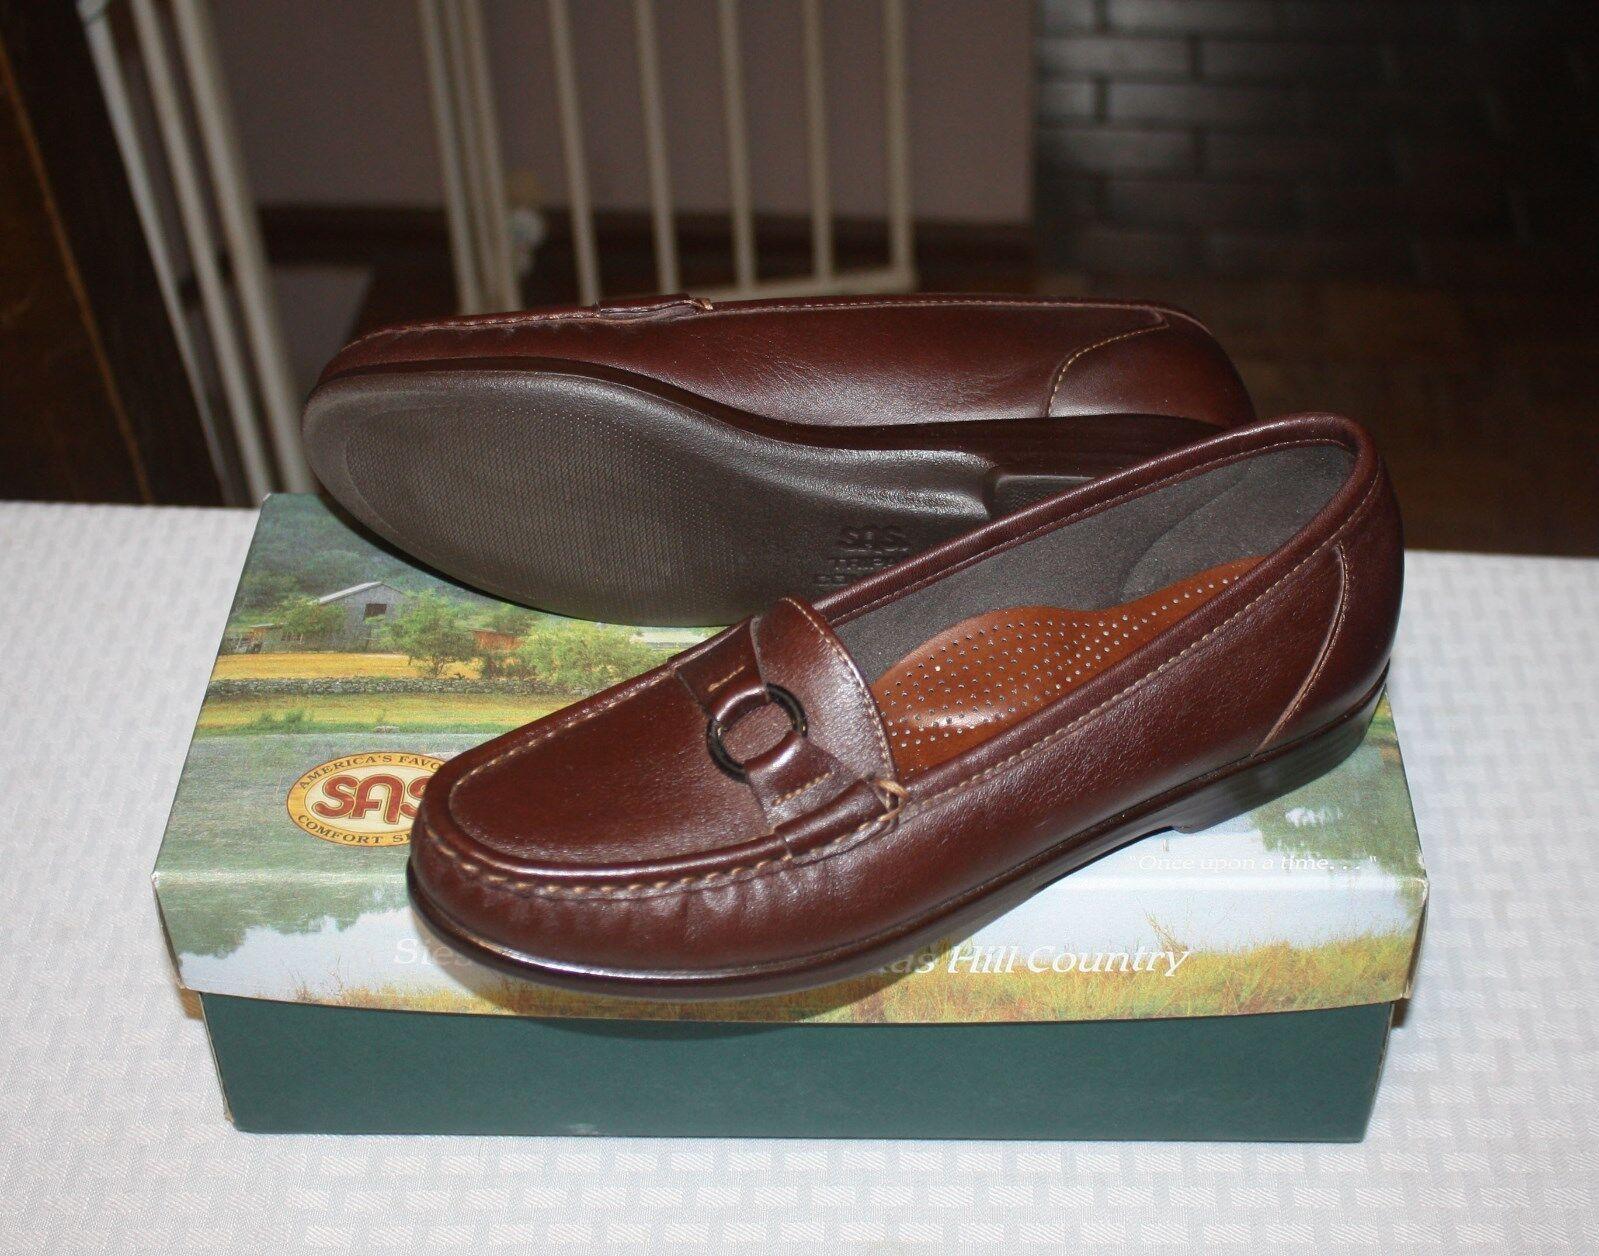 NEU Damenschuhe SAS Jewel Cinnamon Schuhes Größe 7 1/2S